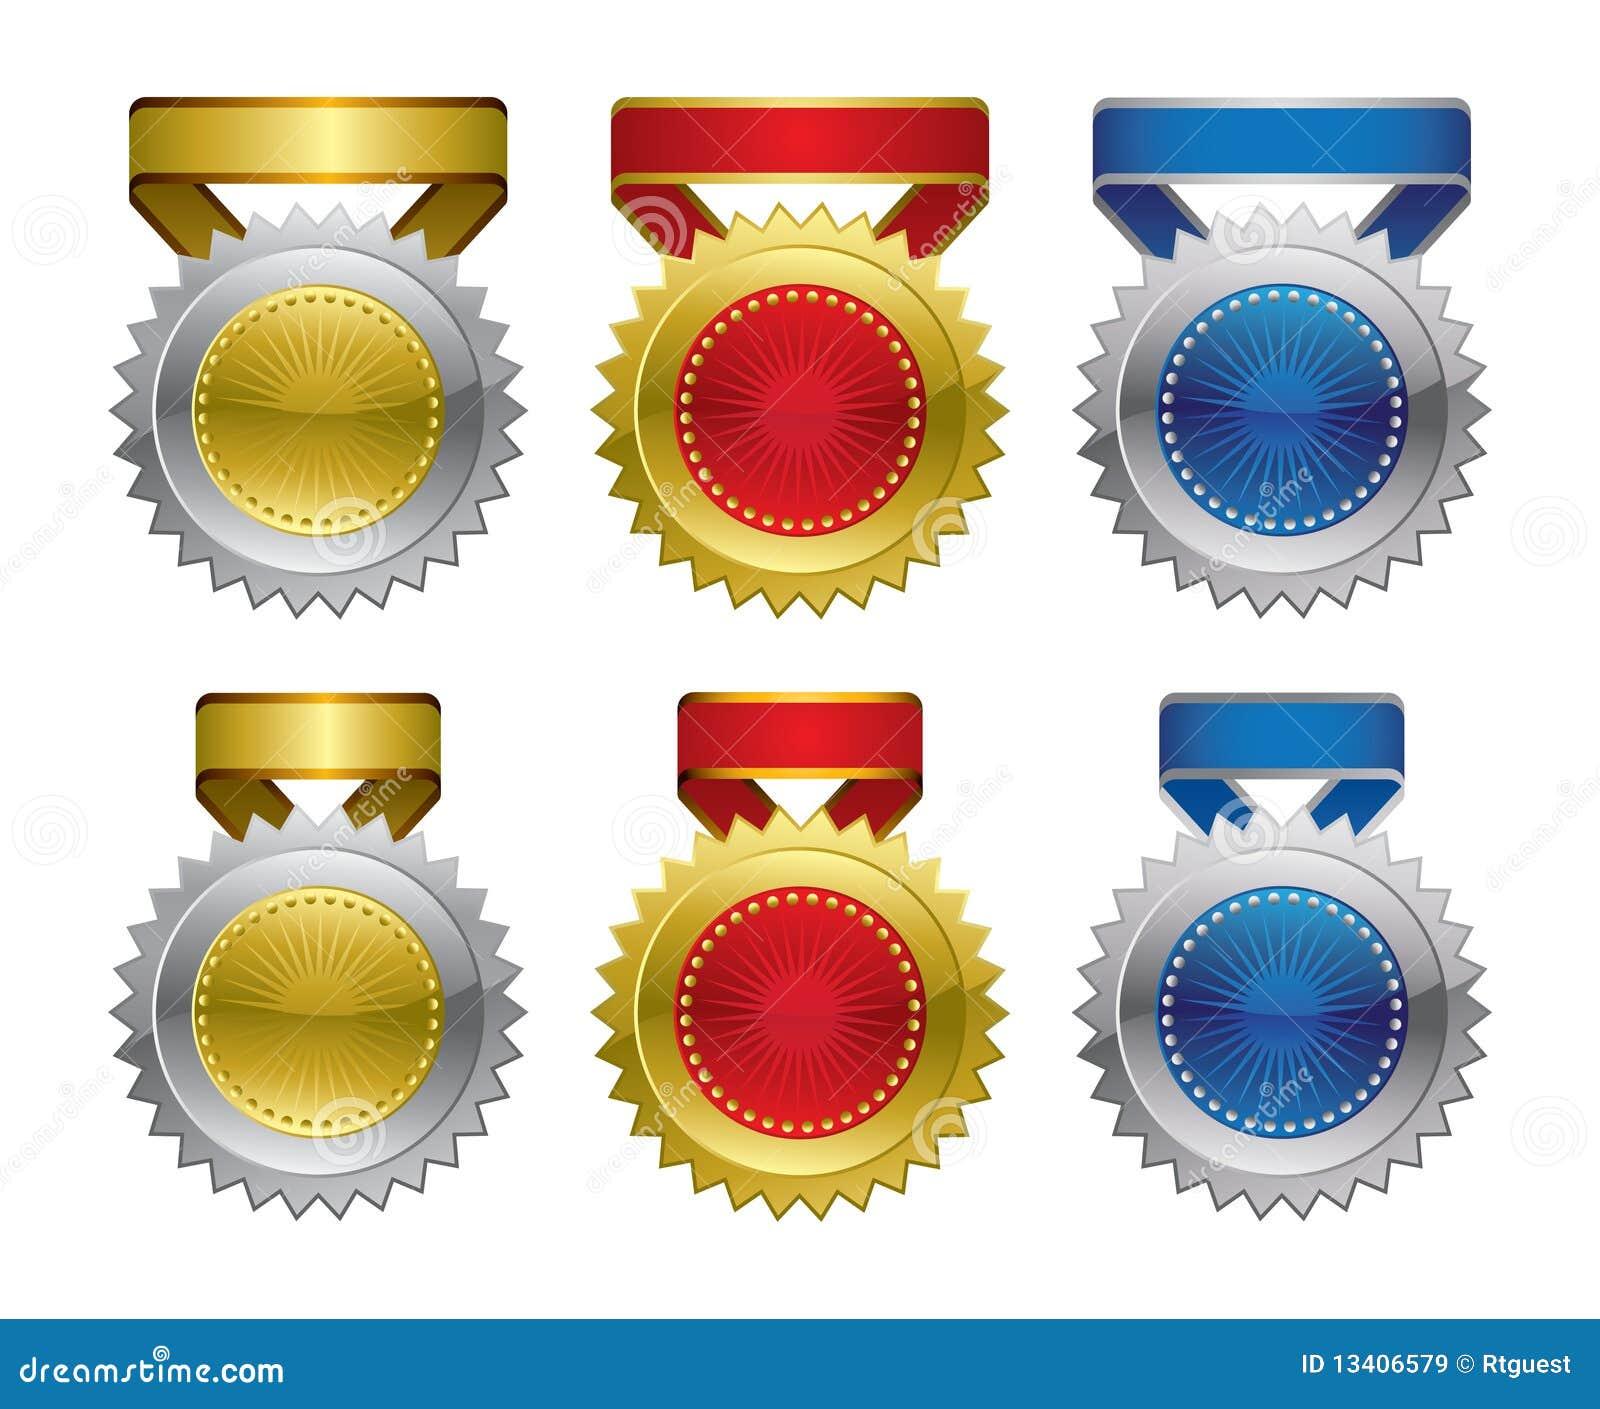 Award Medals Cartoon Vector | CartoonDealer.com #84708911